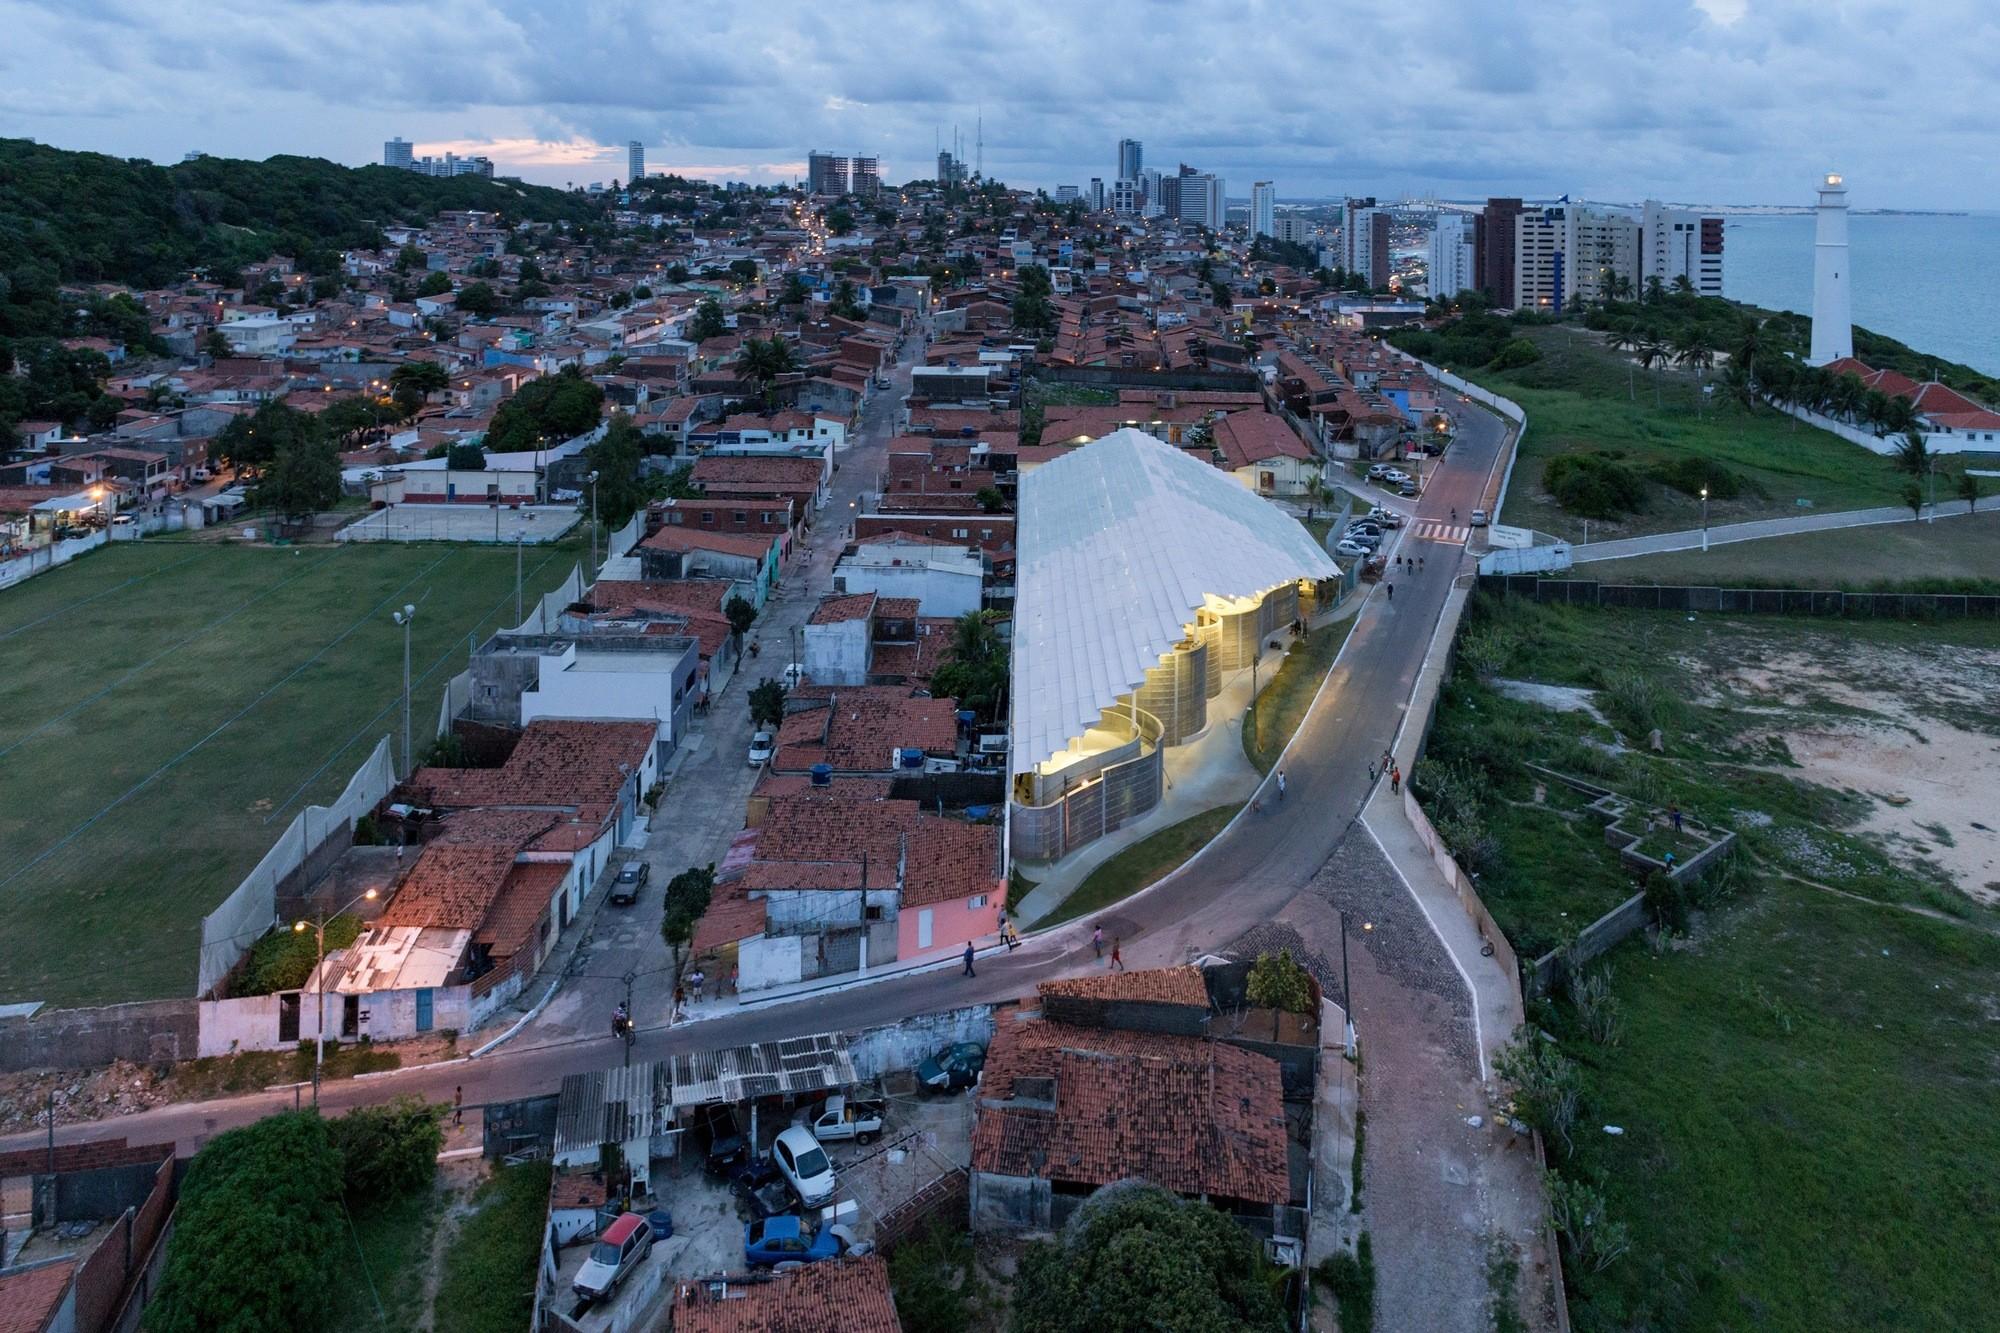 Arena do Morro - Herzog & de Meuron © Iwan Baan